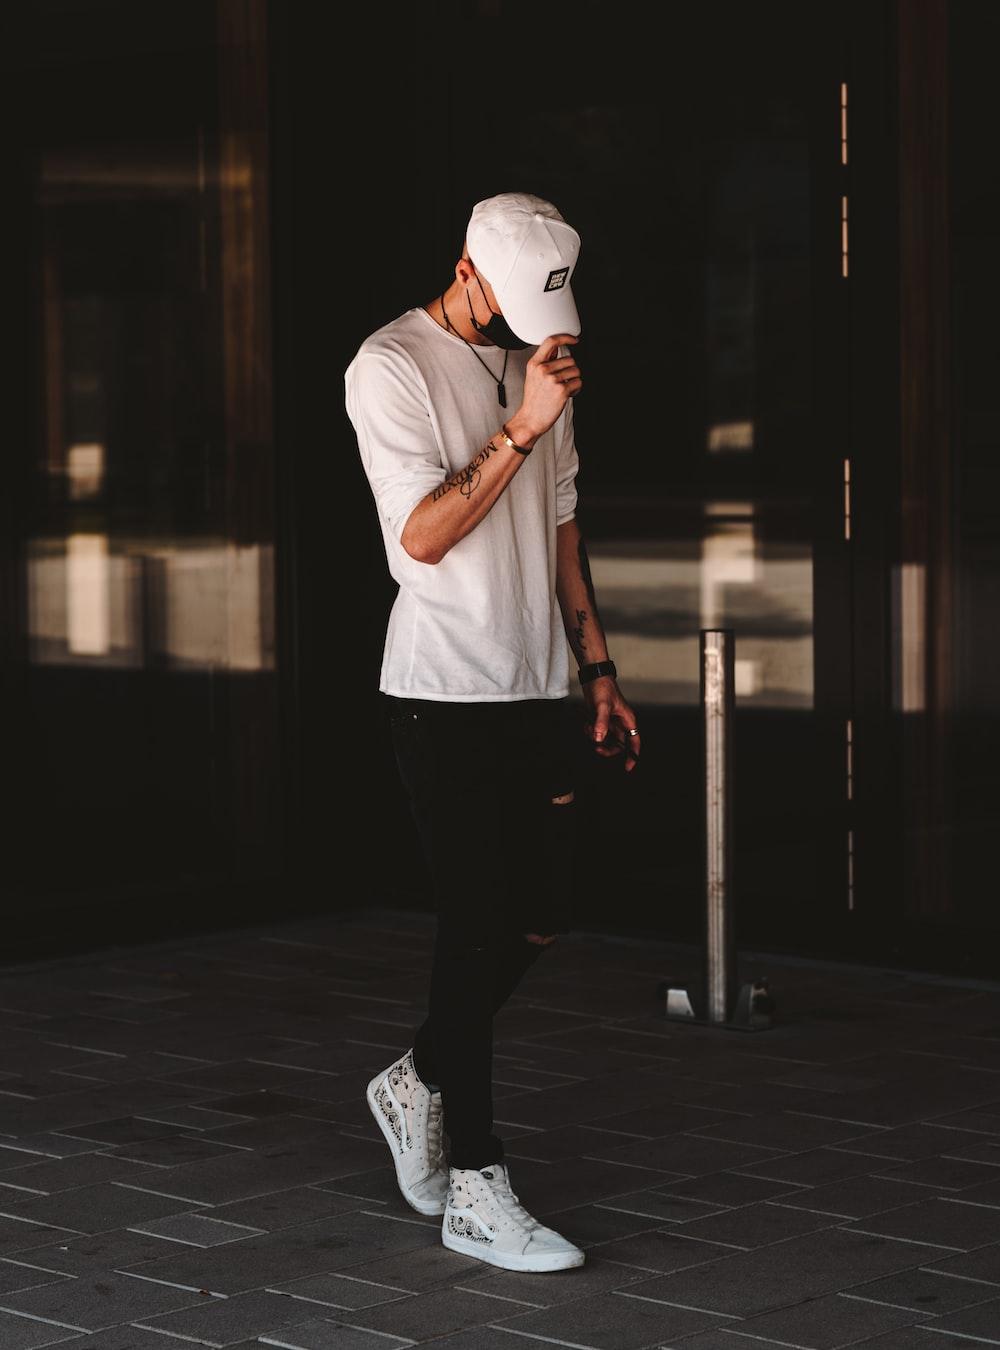 man in white t-shirt and black pants wearing white cap